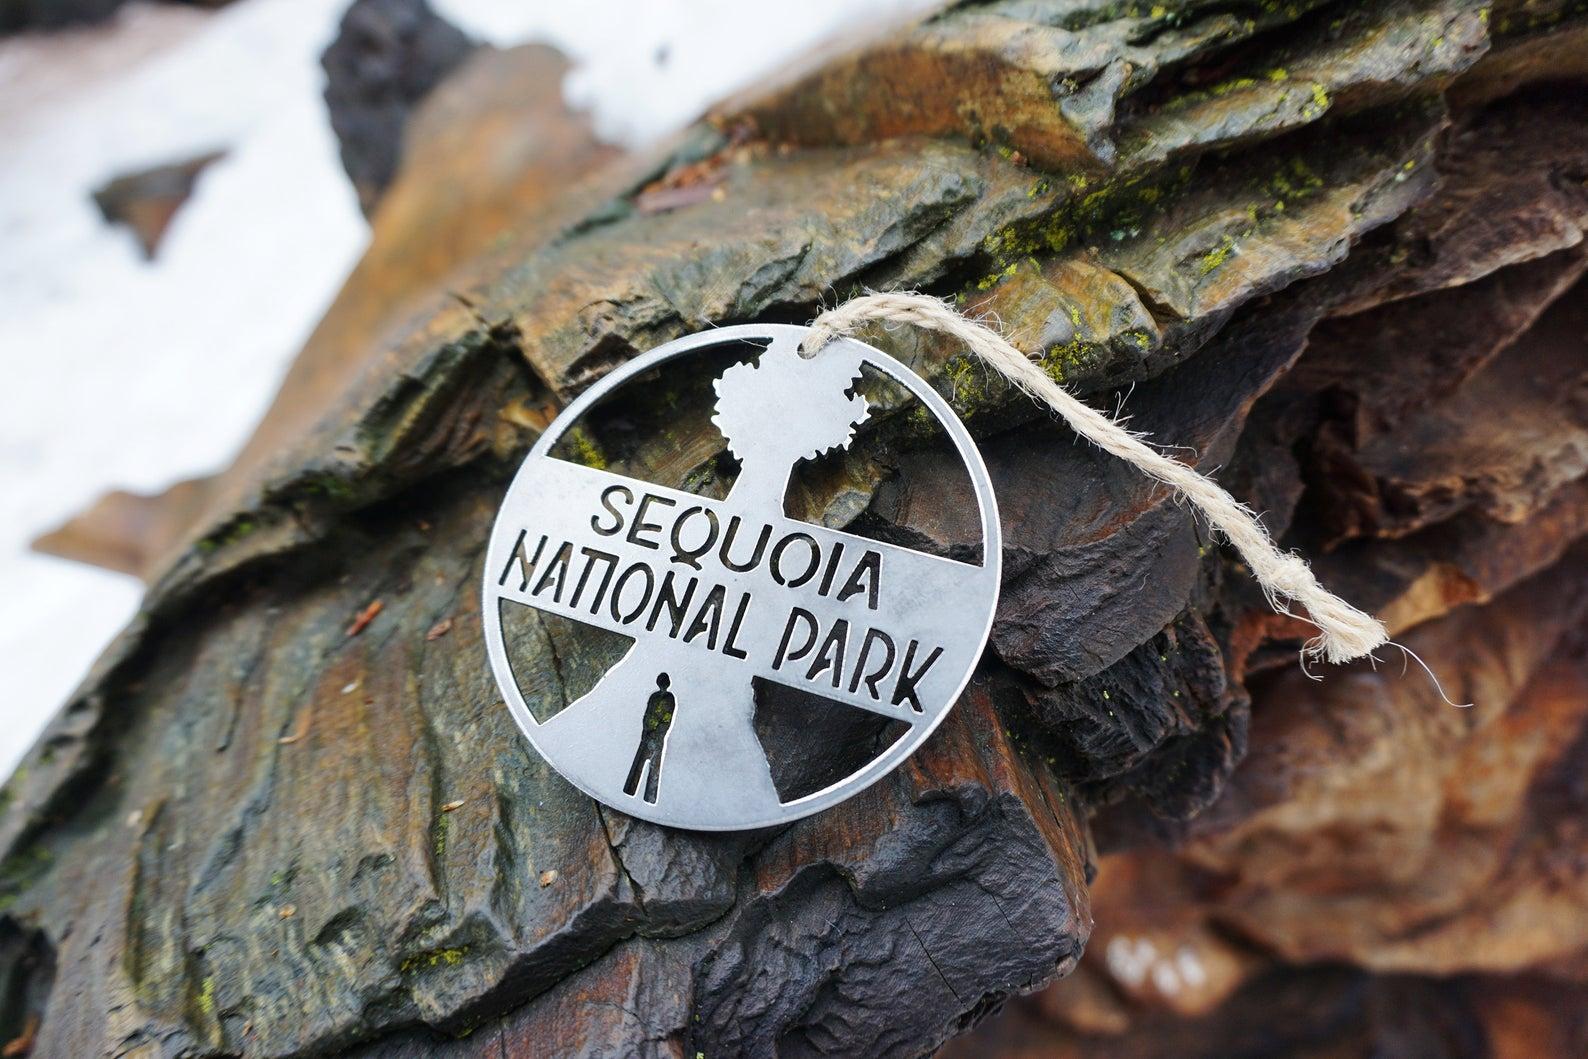 sequoia national park metal ornament